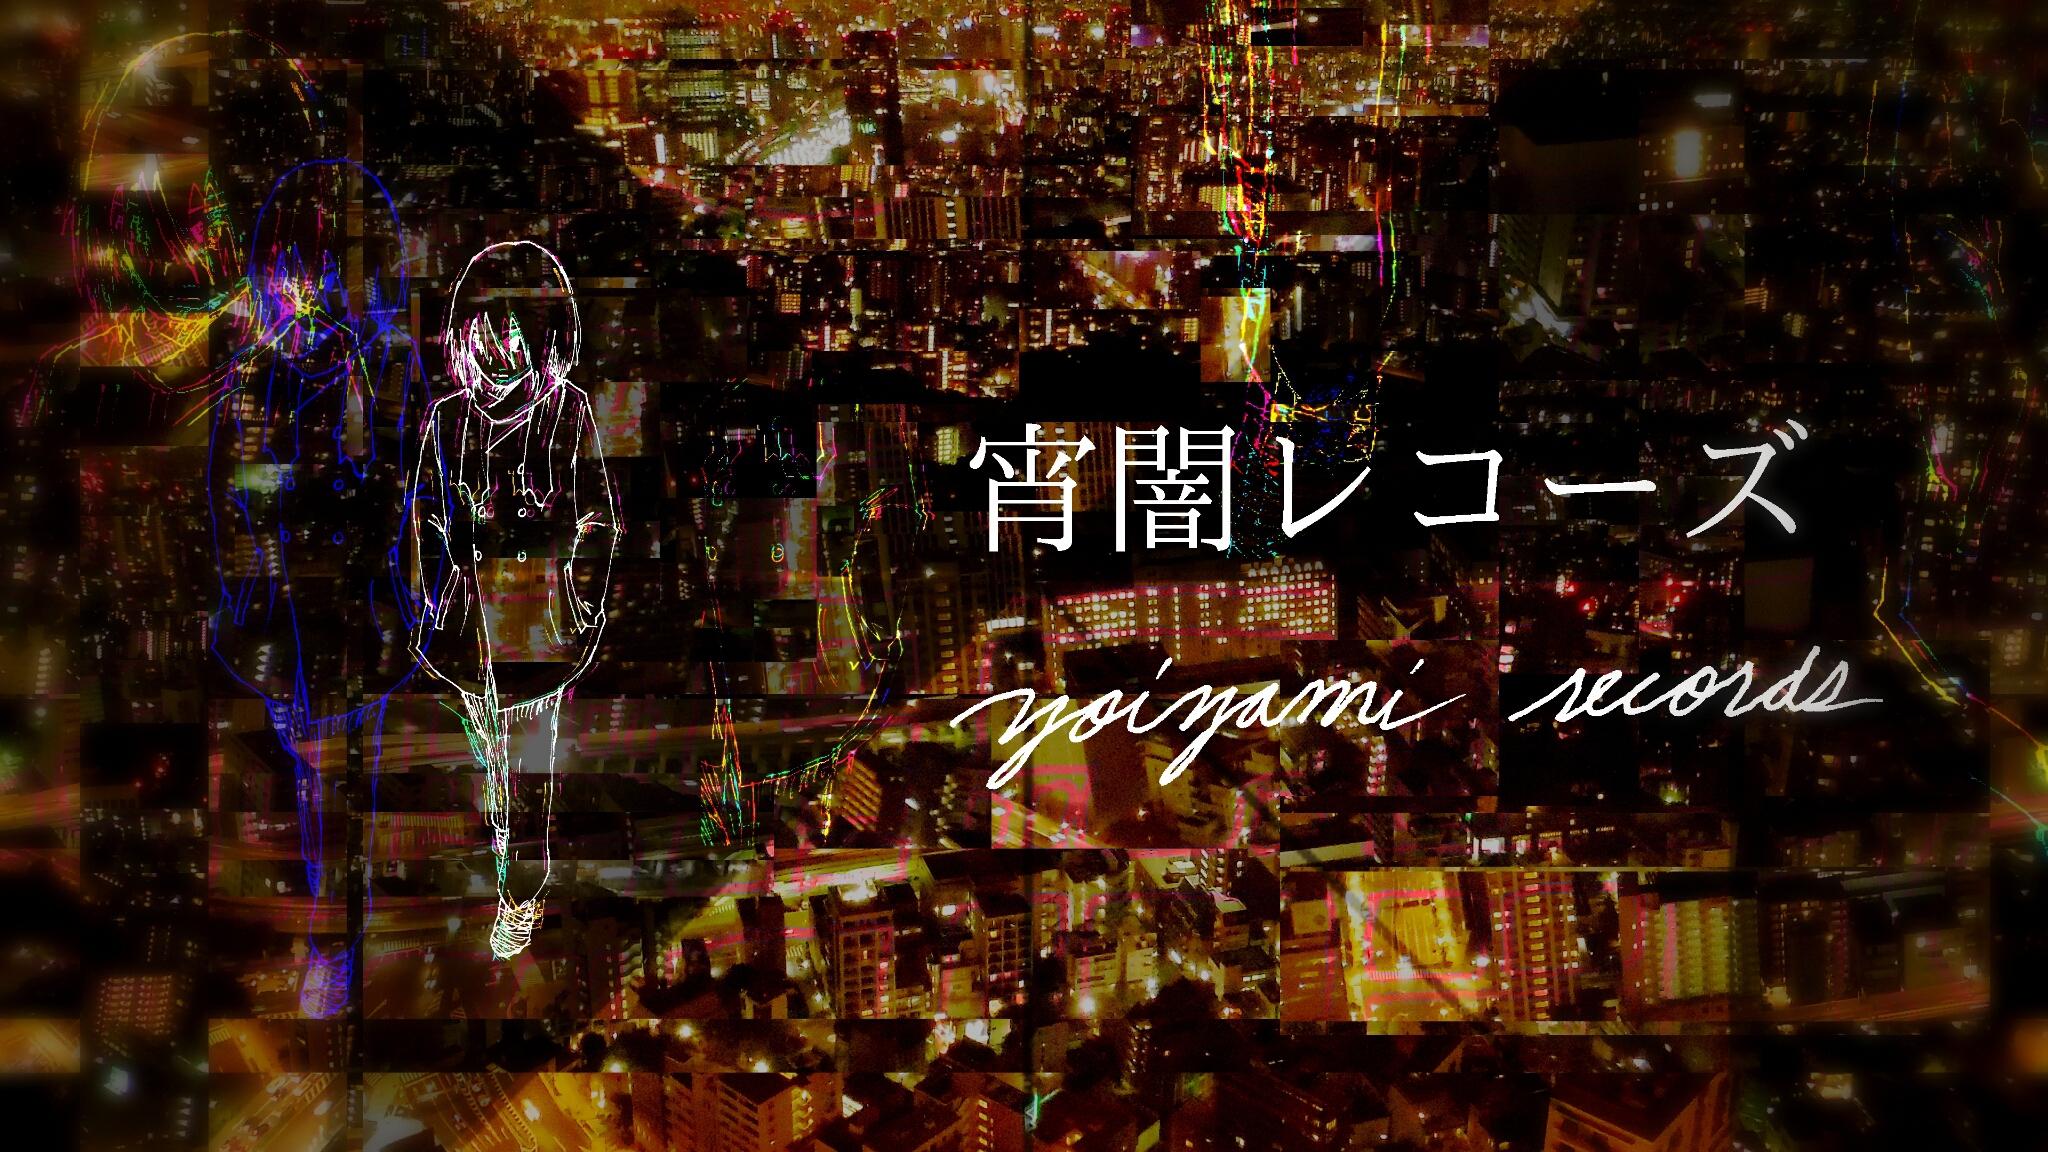 Yoiyami Records Shop